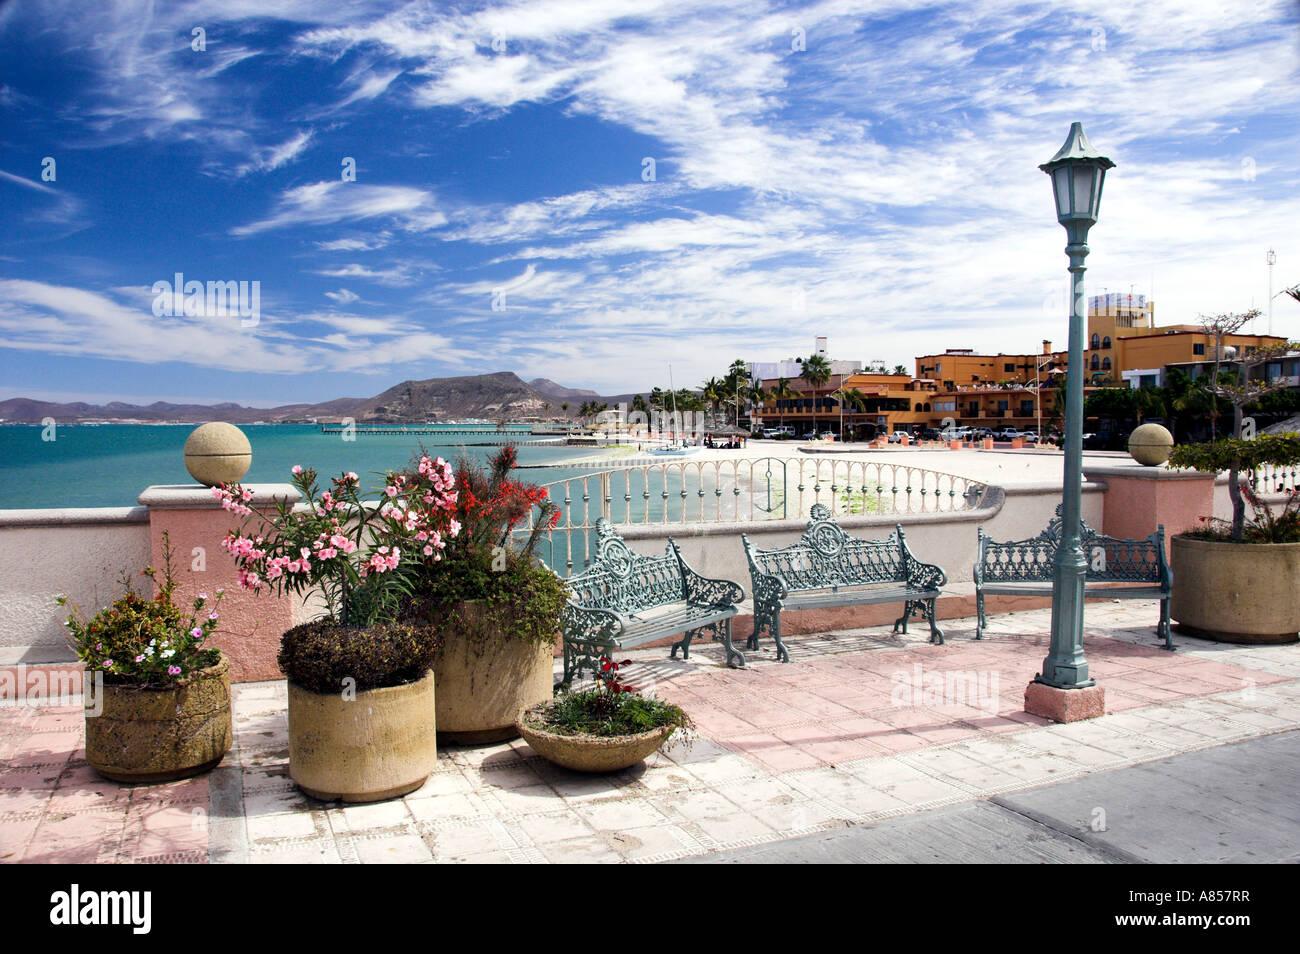 Coastal Sea of Cortez views along the malecon at La Paz, Mexico - Stock Image